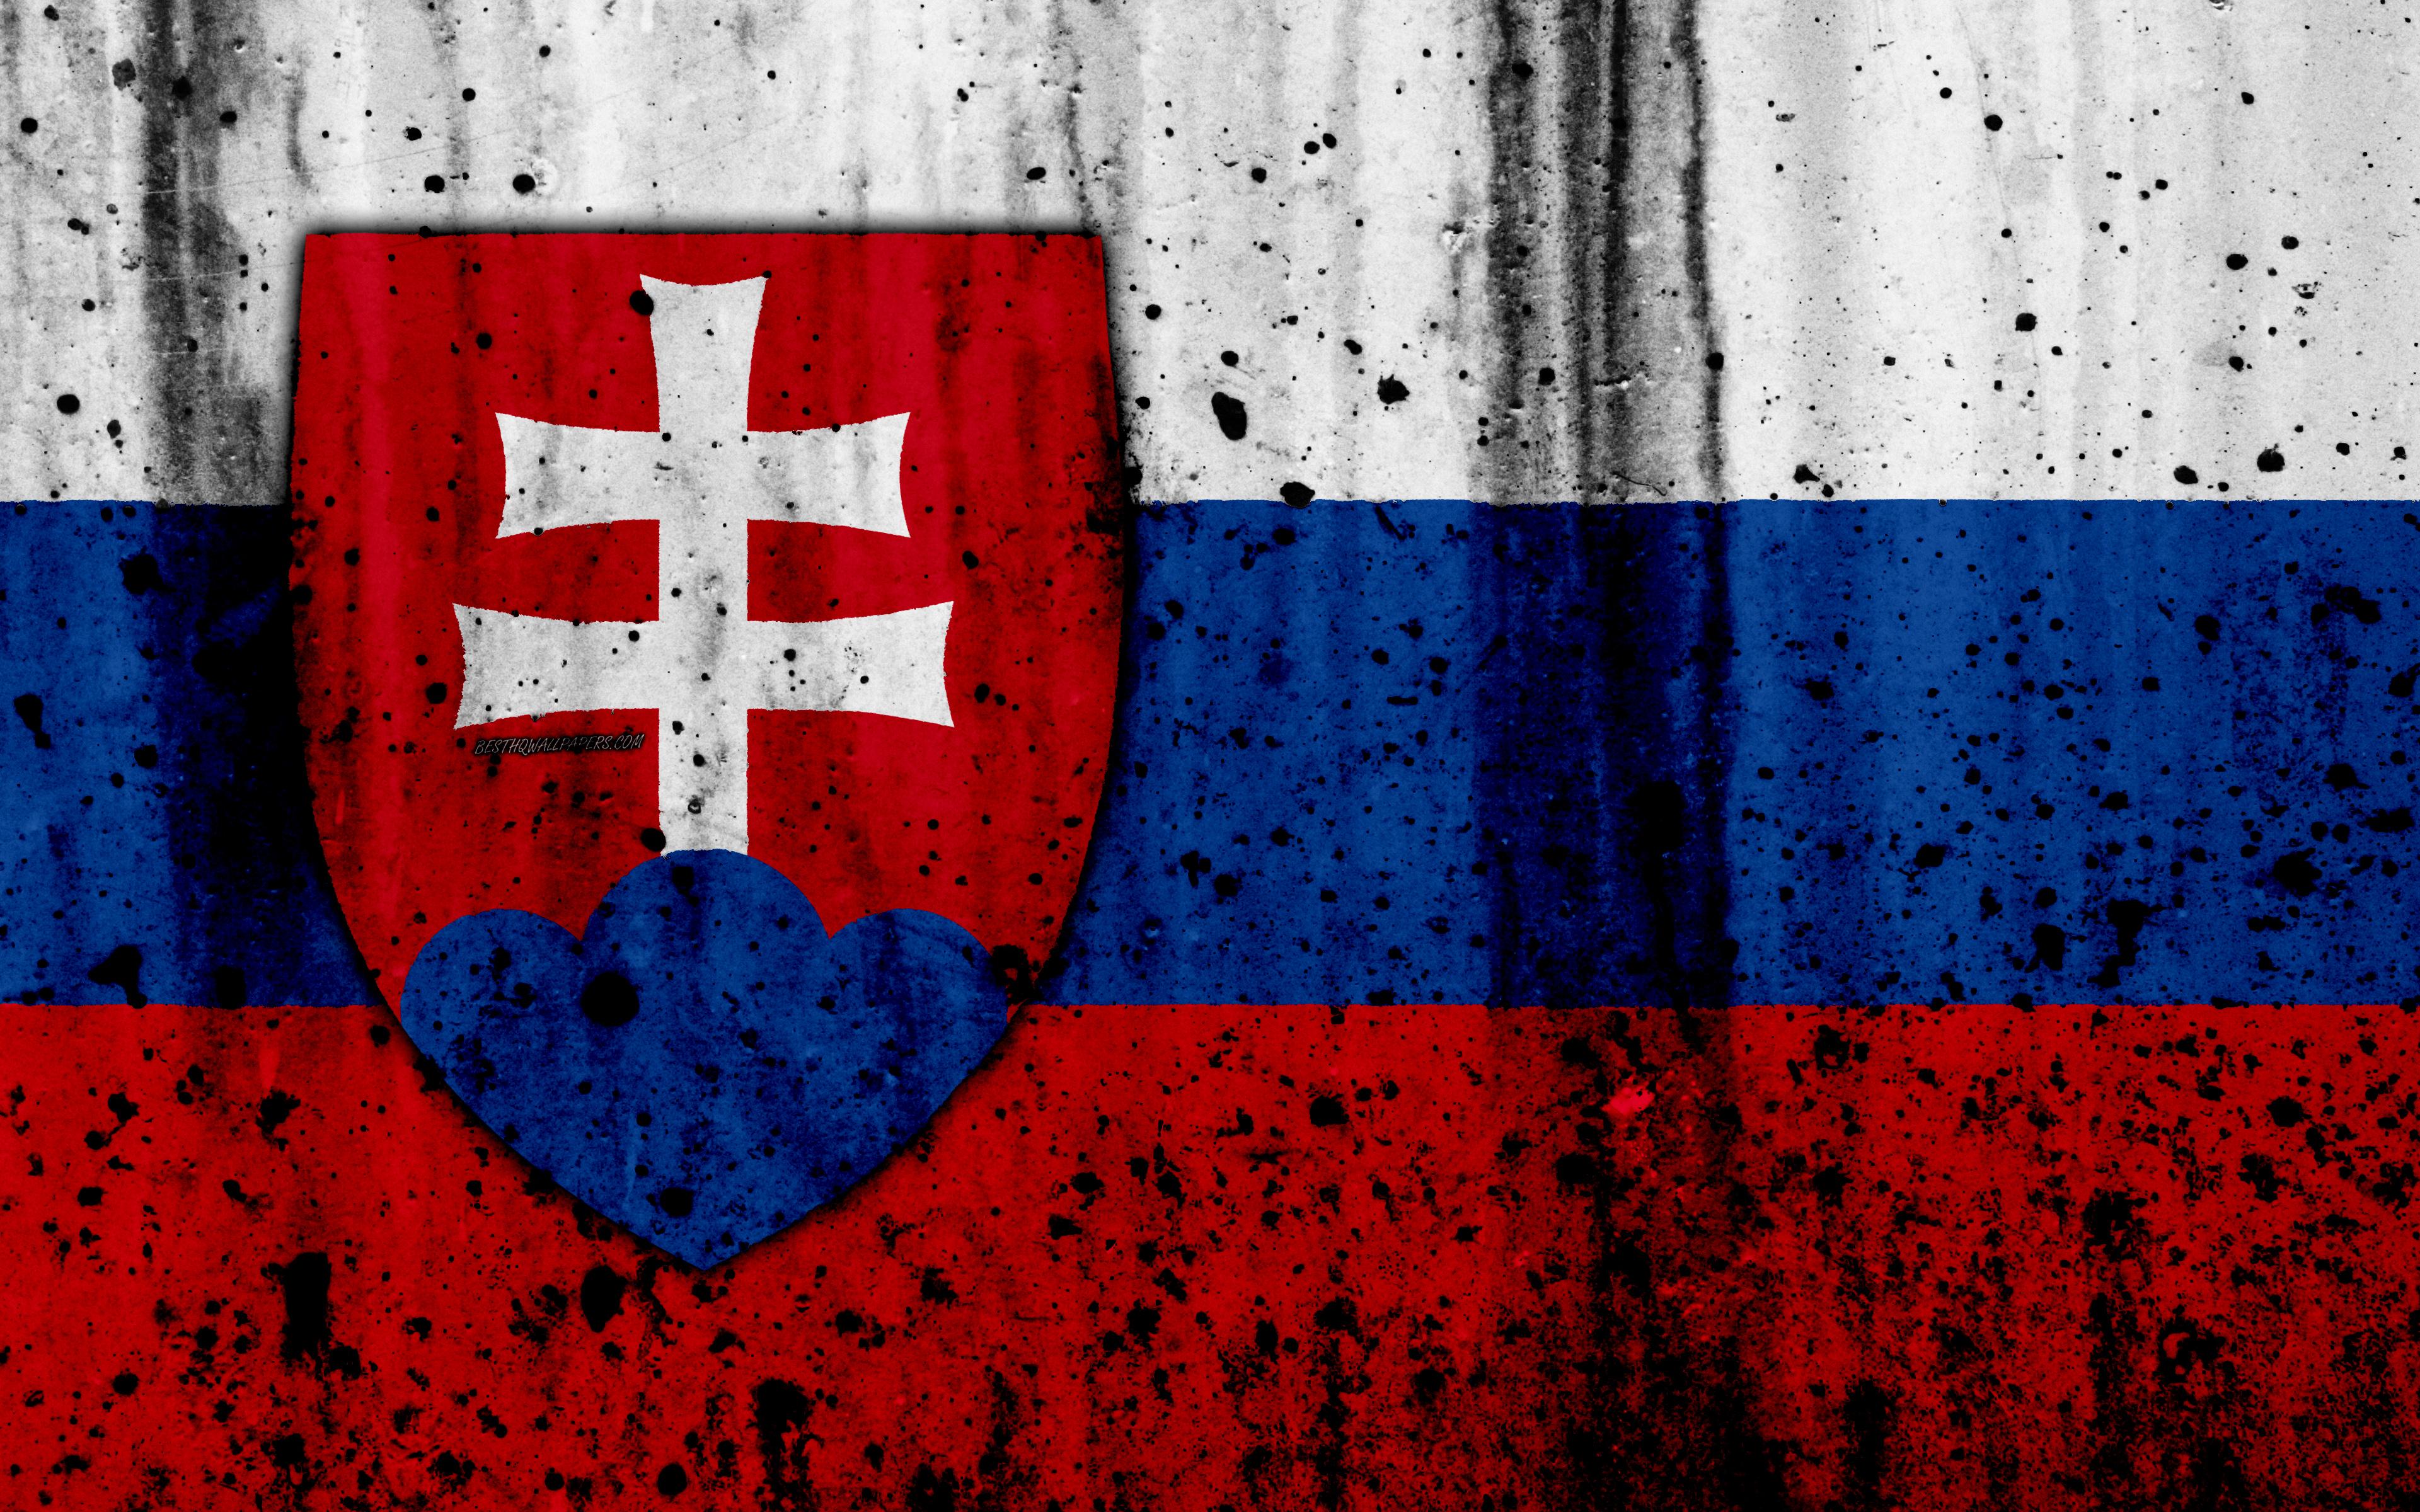 Download wallpapers Slovak flag 4k grunge flag of Slovakia 3840x2400